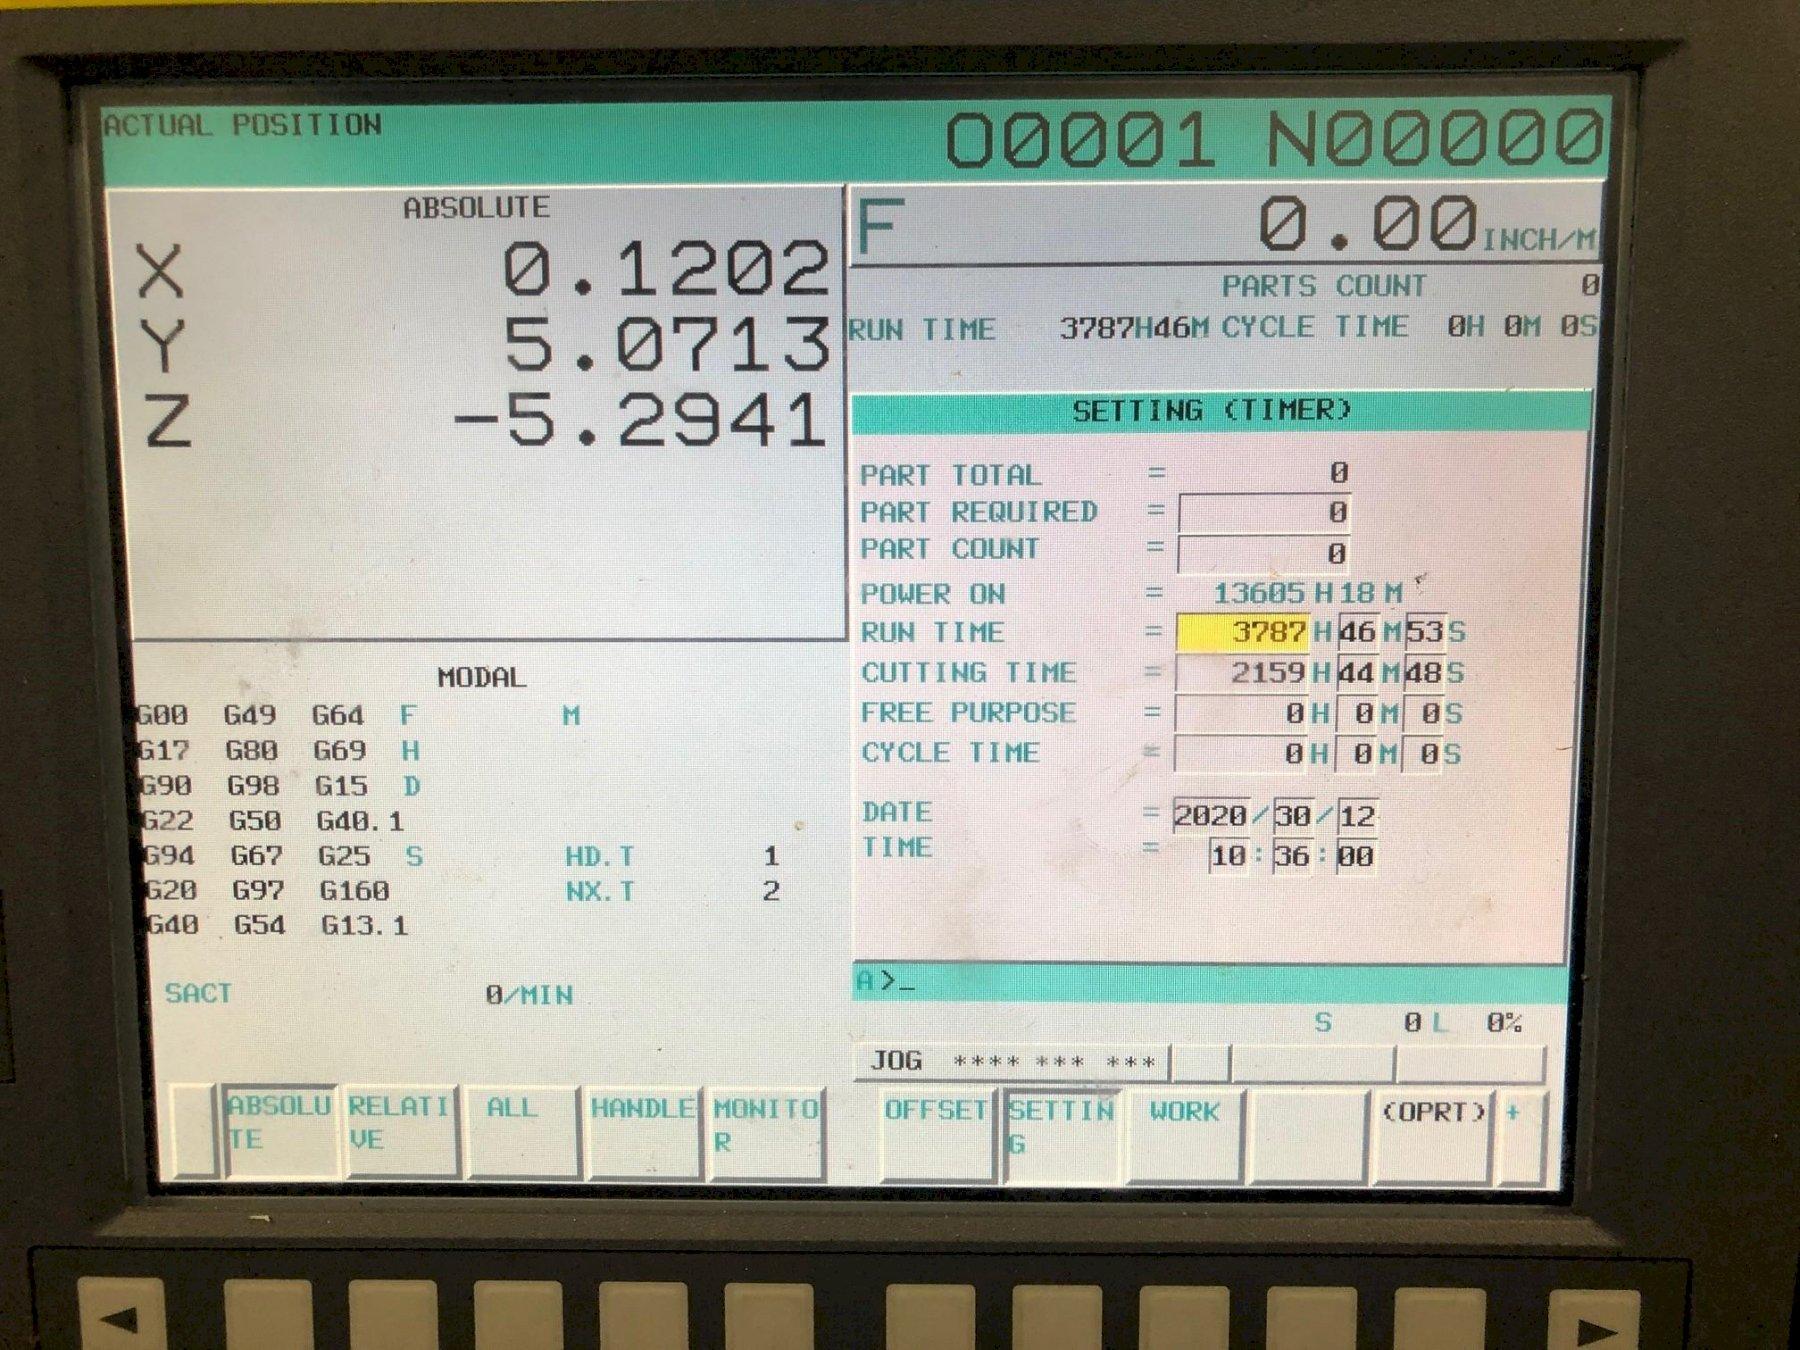 DOOSAN2013 Doosan DNM 400 4-Axis CNC Vertical Machining Centers - 2 Available!